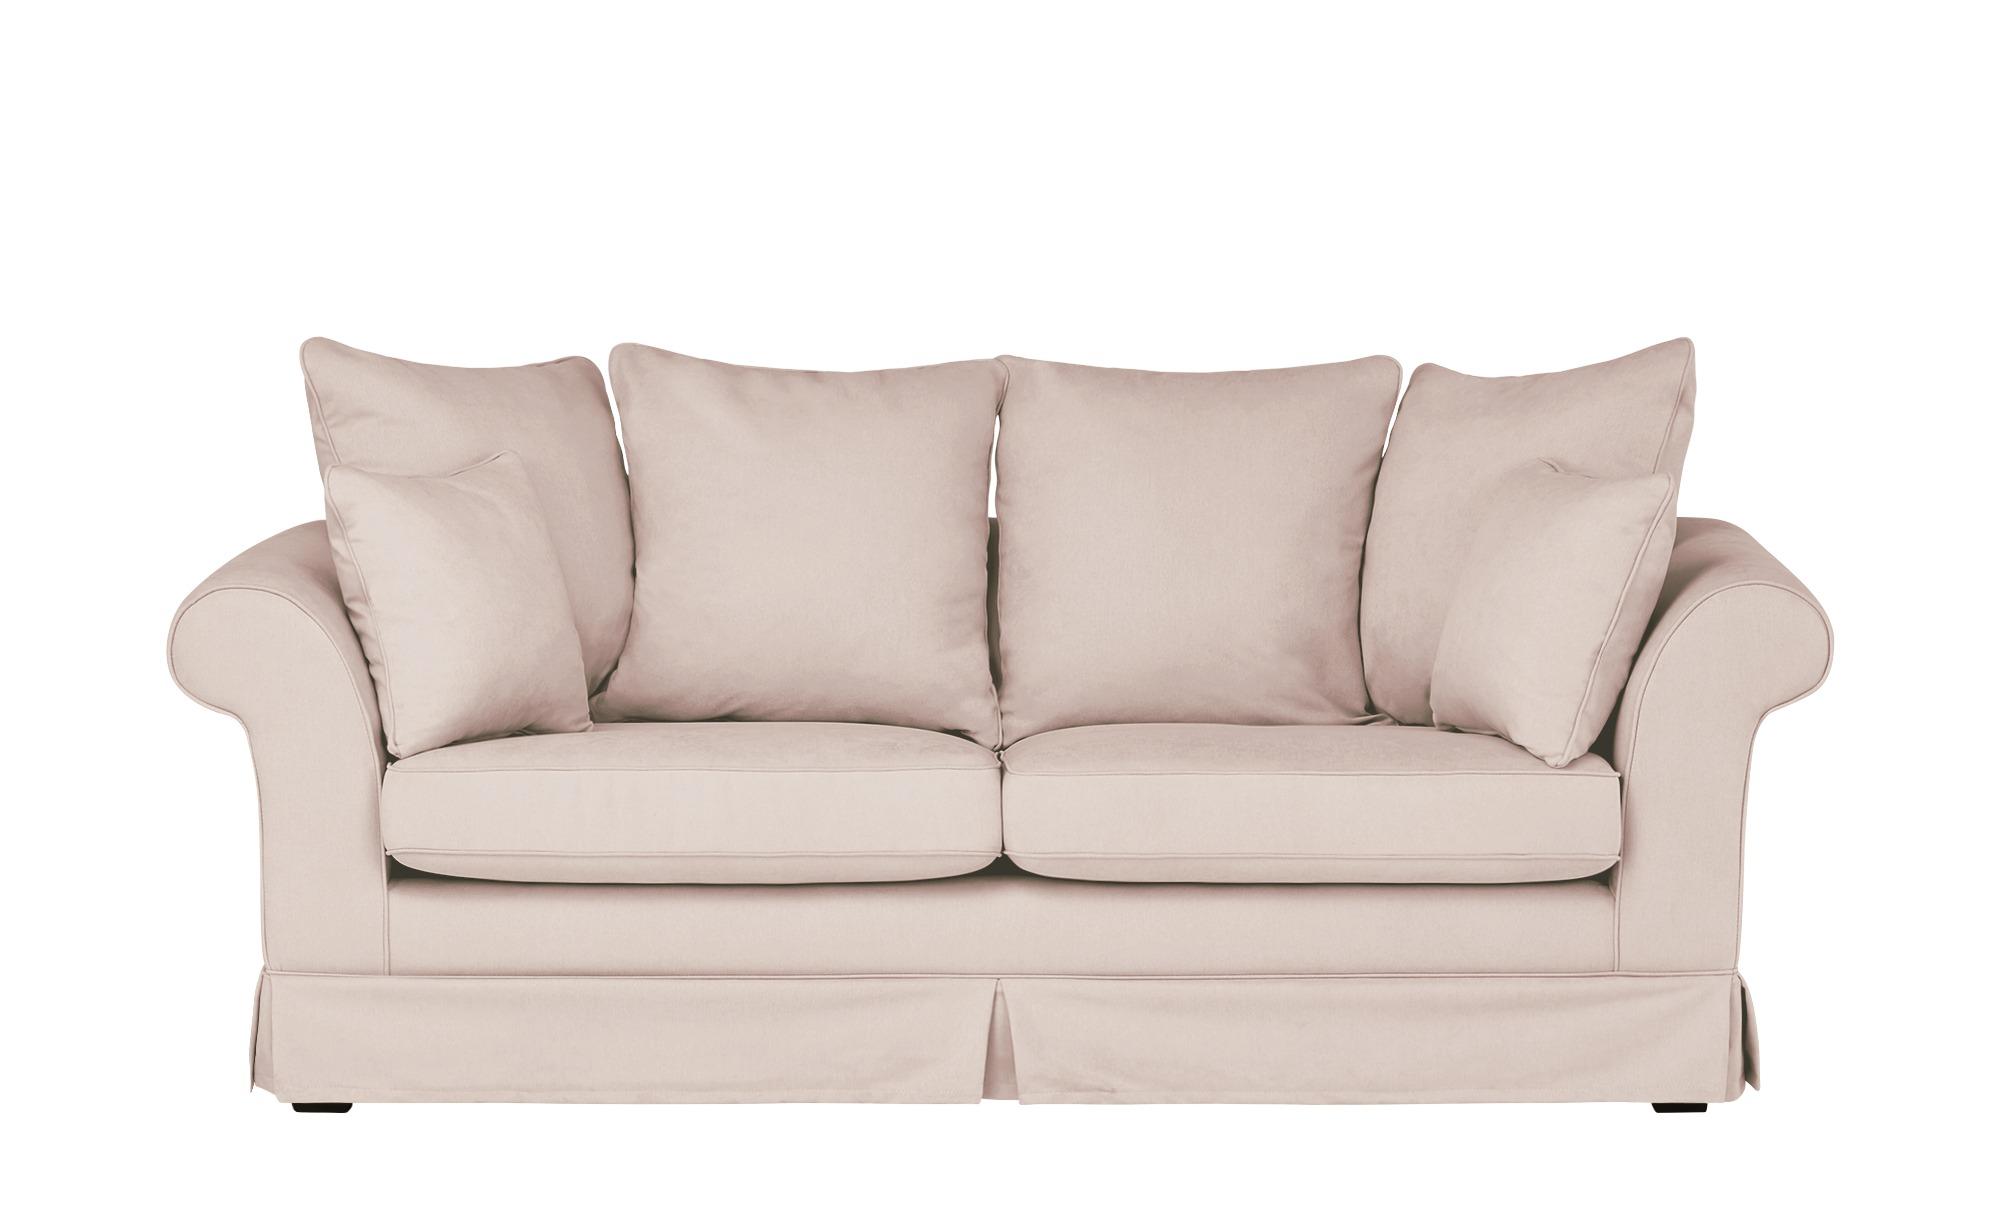 Hussensofa, 3-sitzig  Hampton ¦ rosa/pink ¦ Maße (cm): B: 214 H: 70 T: 92 Polstermöbel > Sofas > 3-Sitzer - Höffner